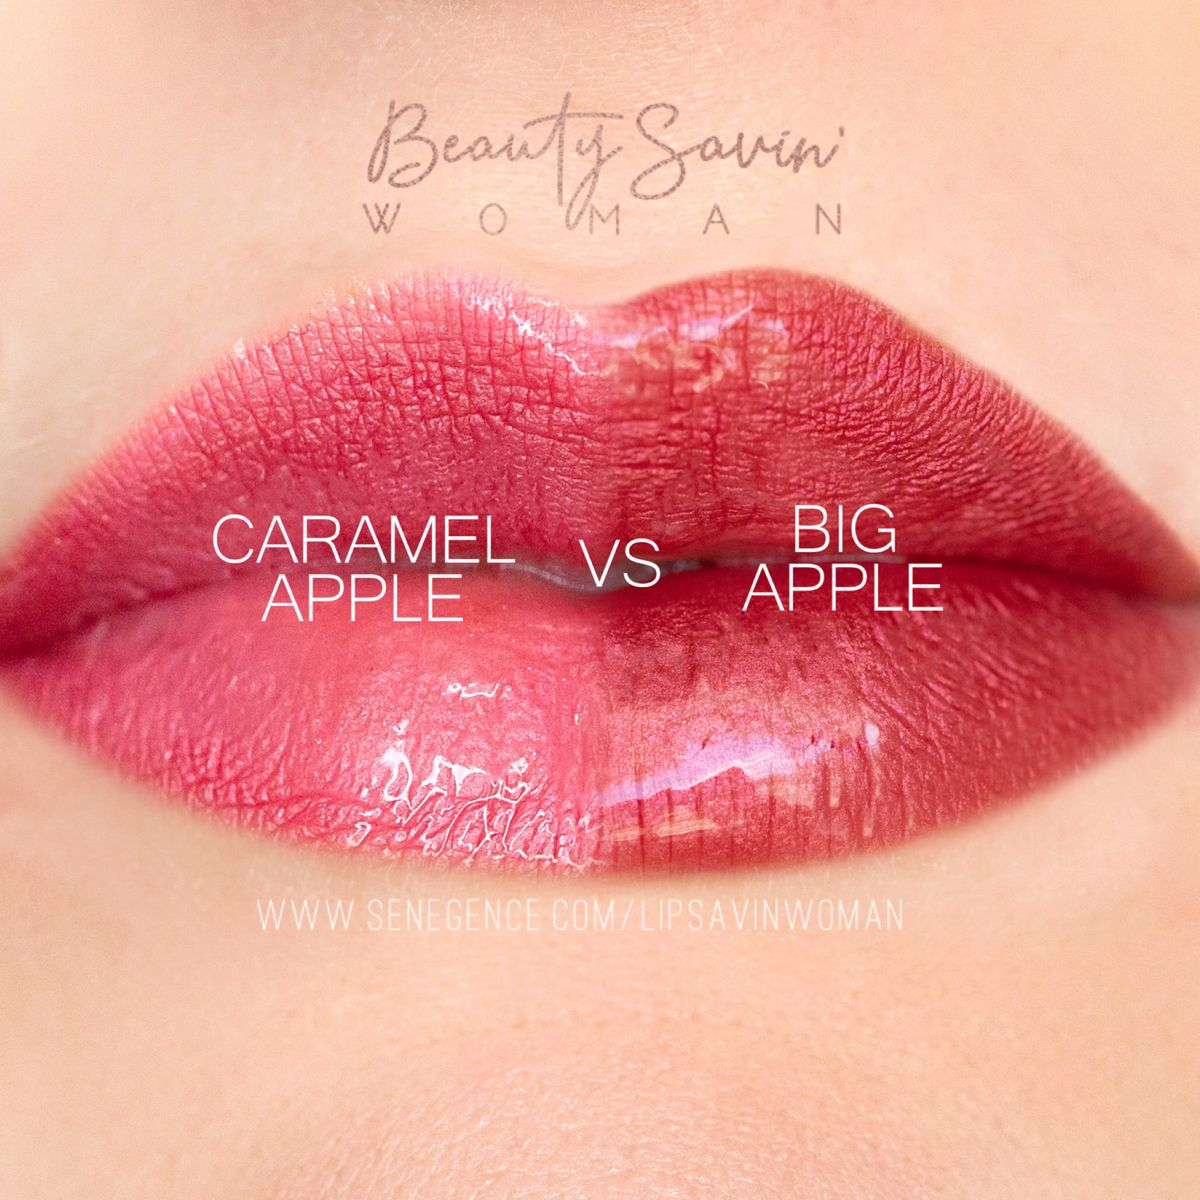 Caramel Apple vs Big Apple in 2020 Senegence makeup